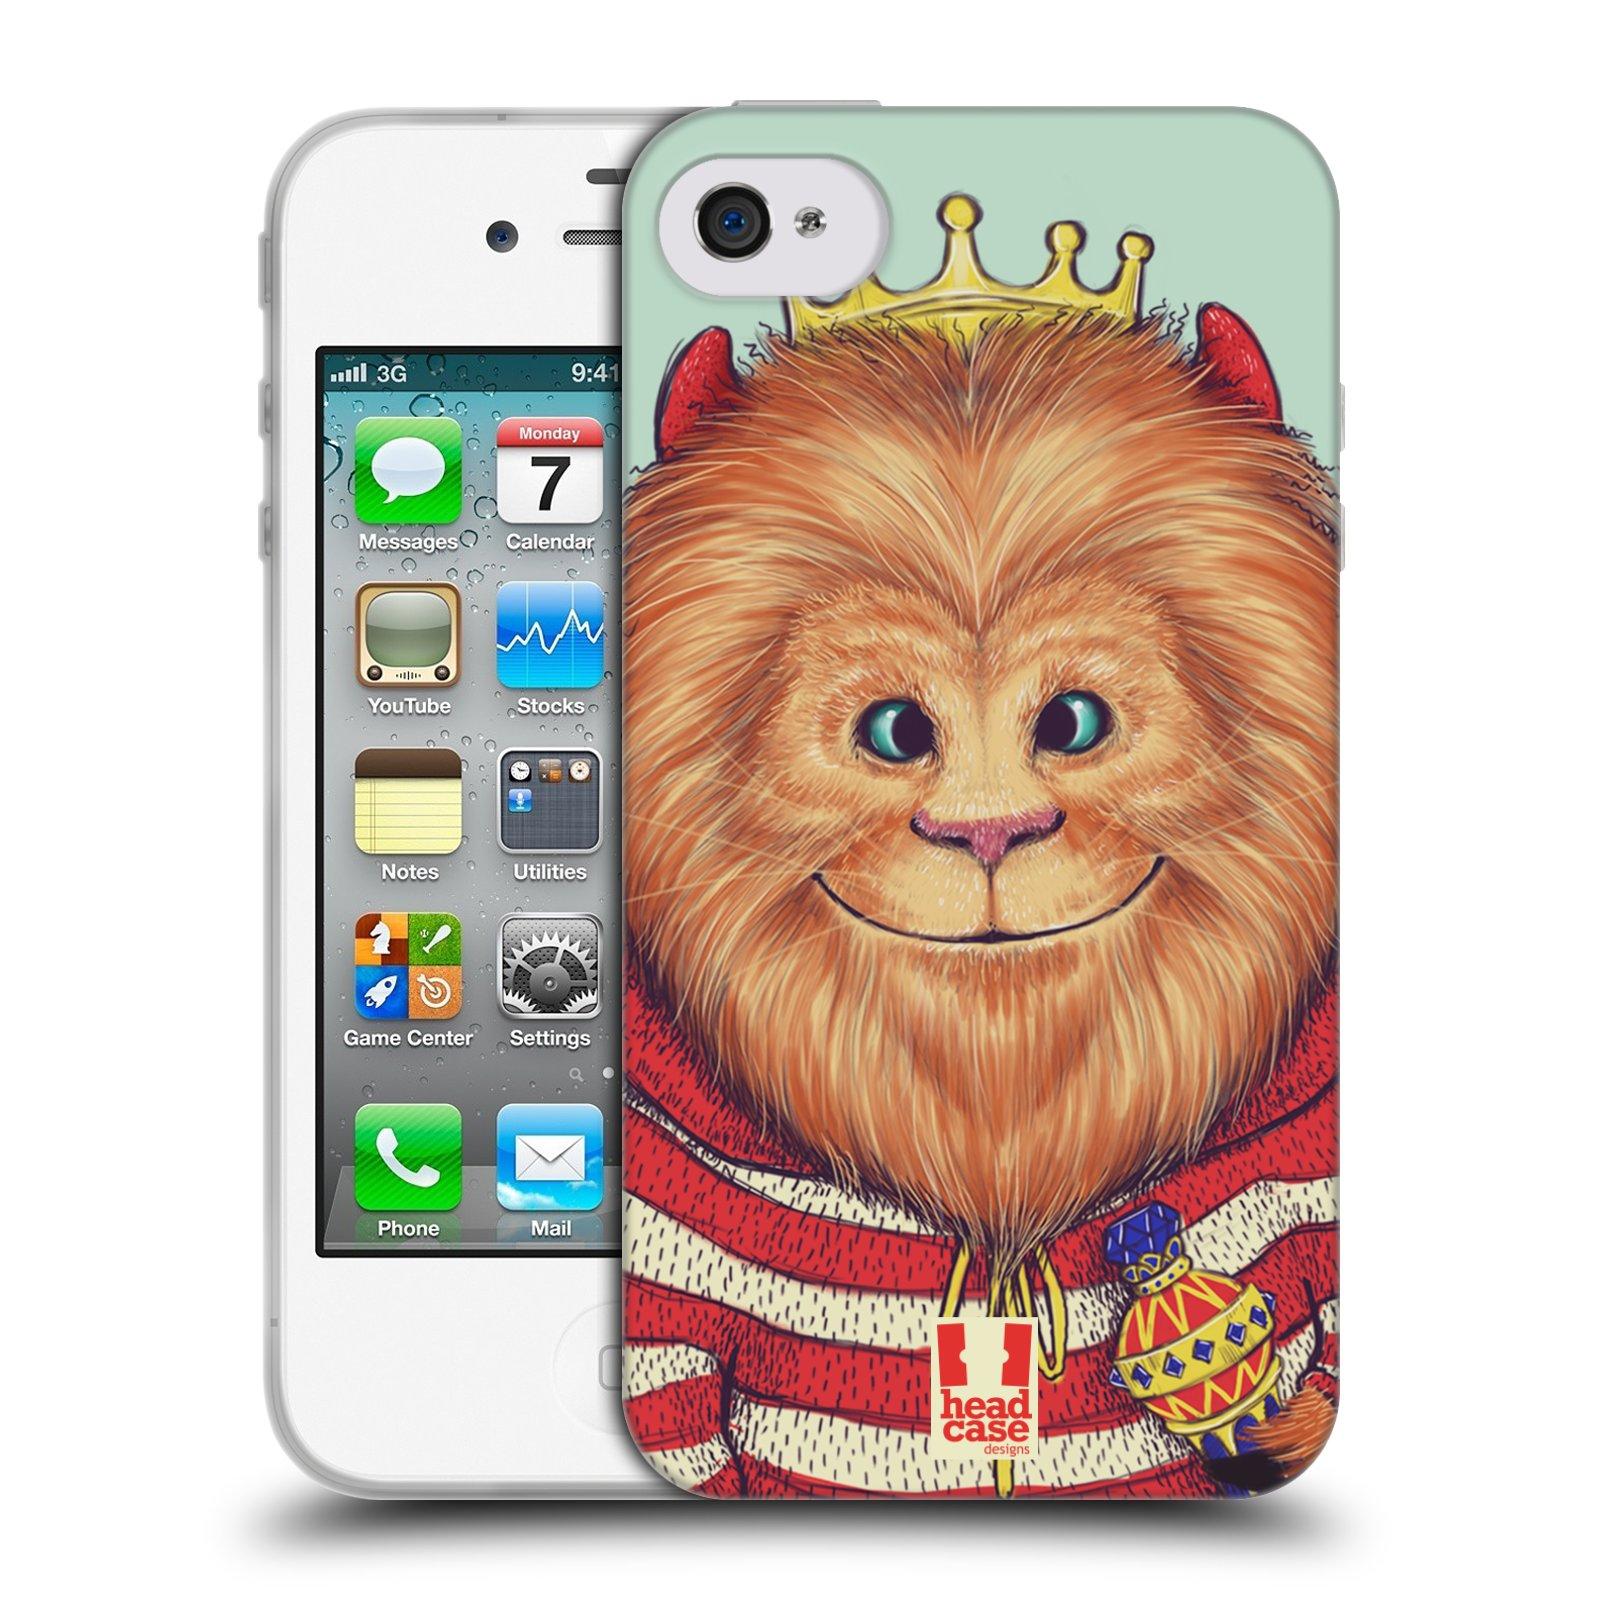 HEAD CASE silikonový obal na mobil Apple Iphone 4/4S vzor Kreslená zvířátka lev